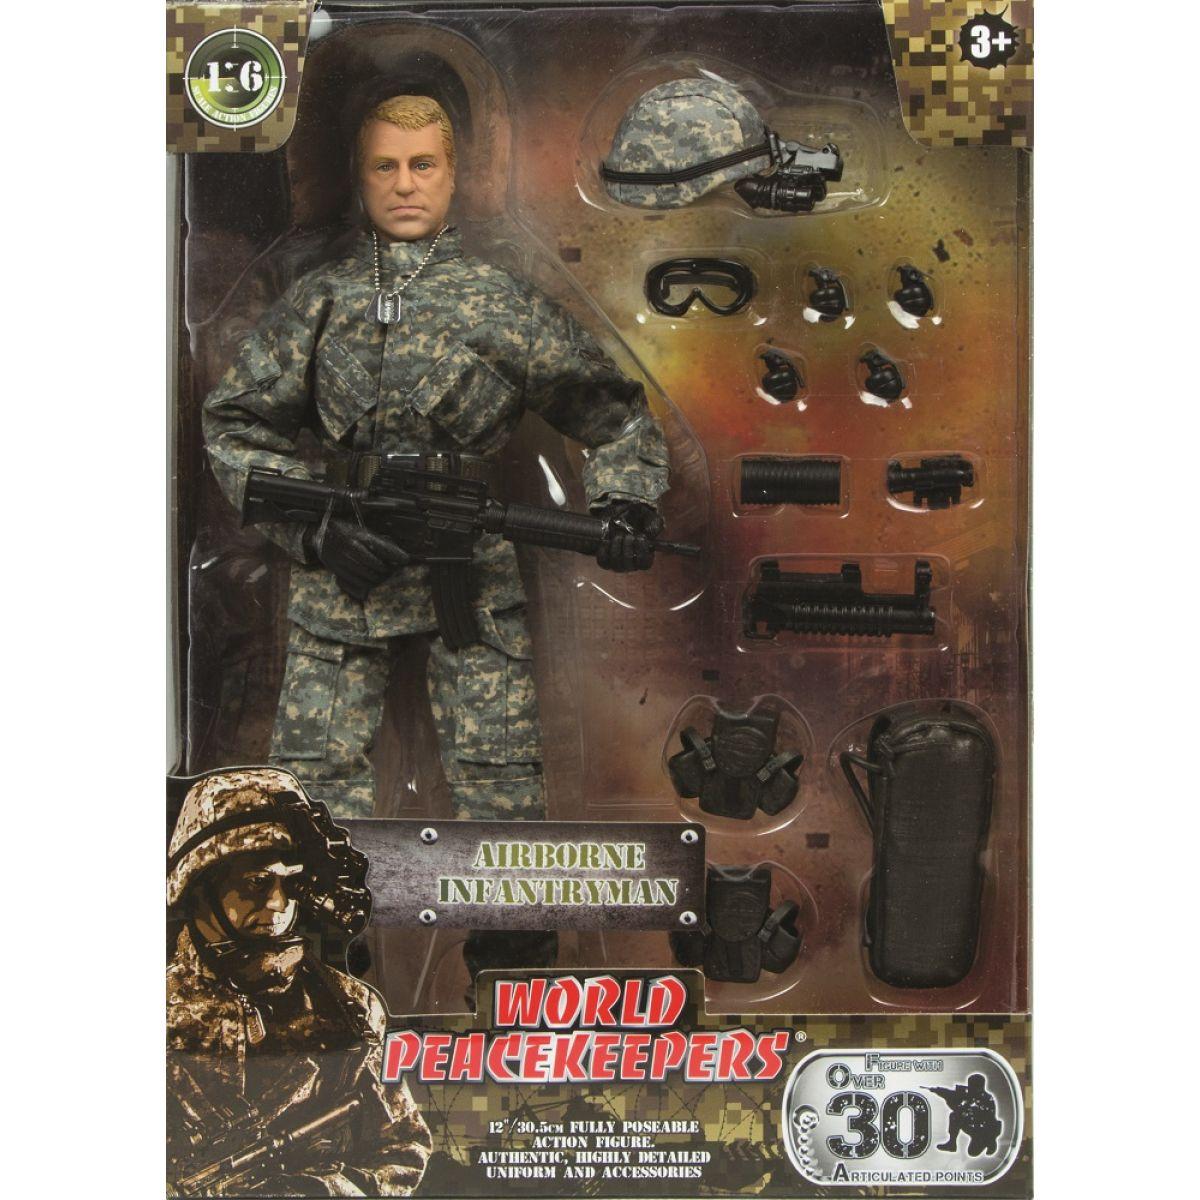 World Peacekeepers Voják figurka 30,5cm - Airborne Infantryman #2